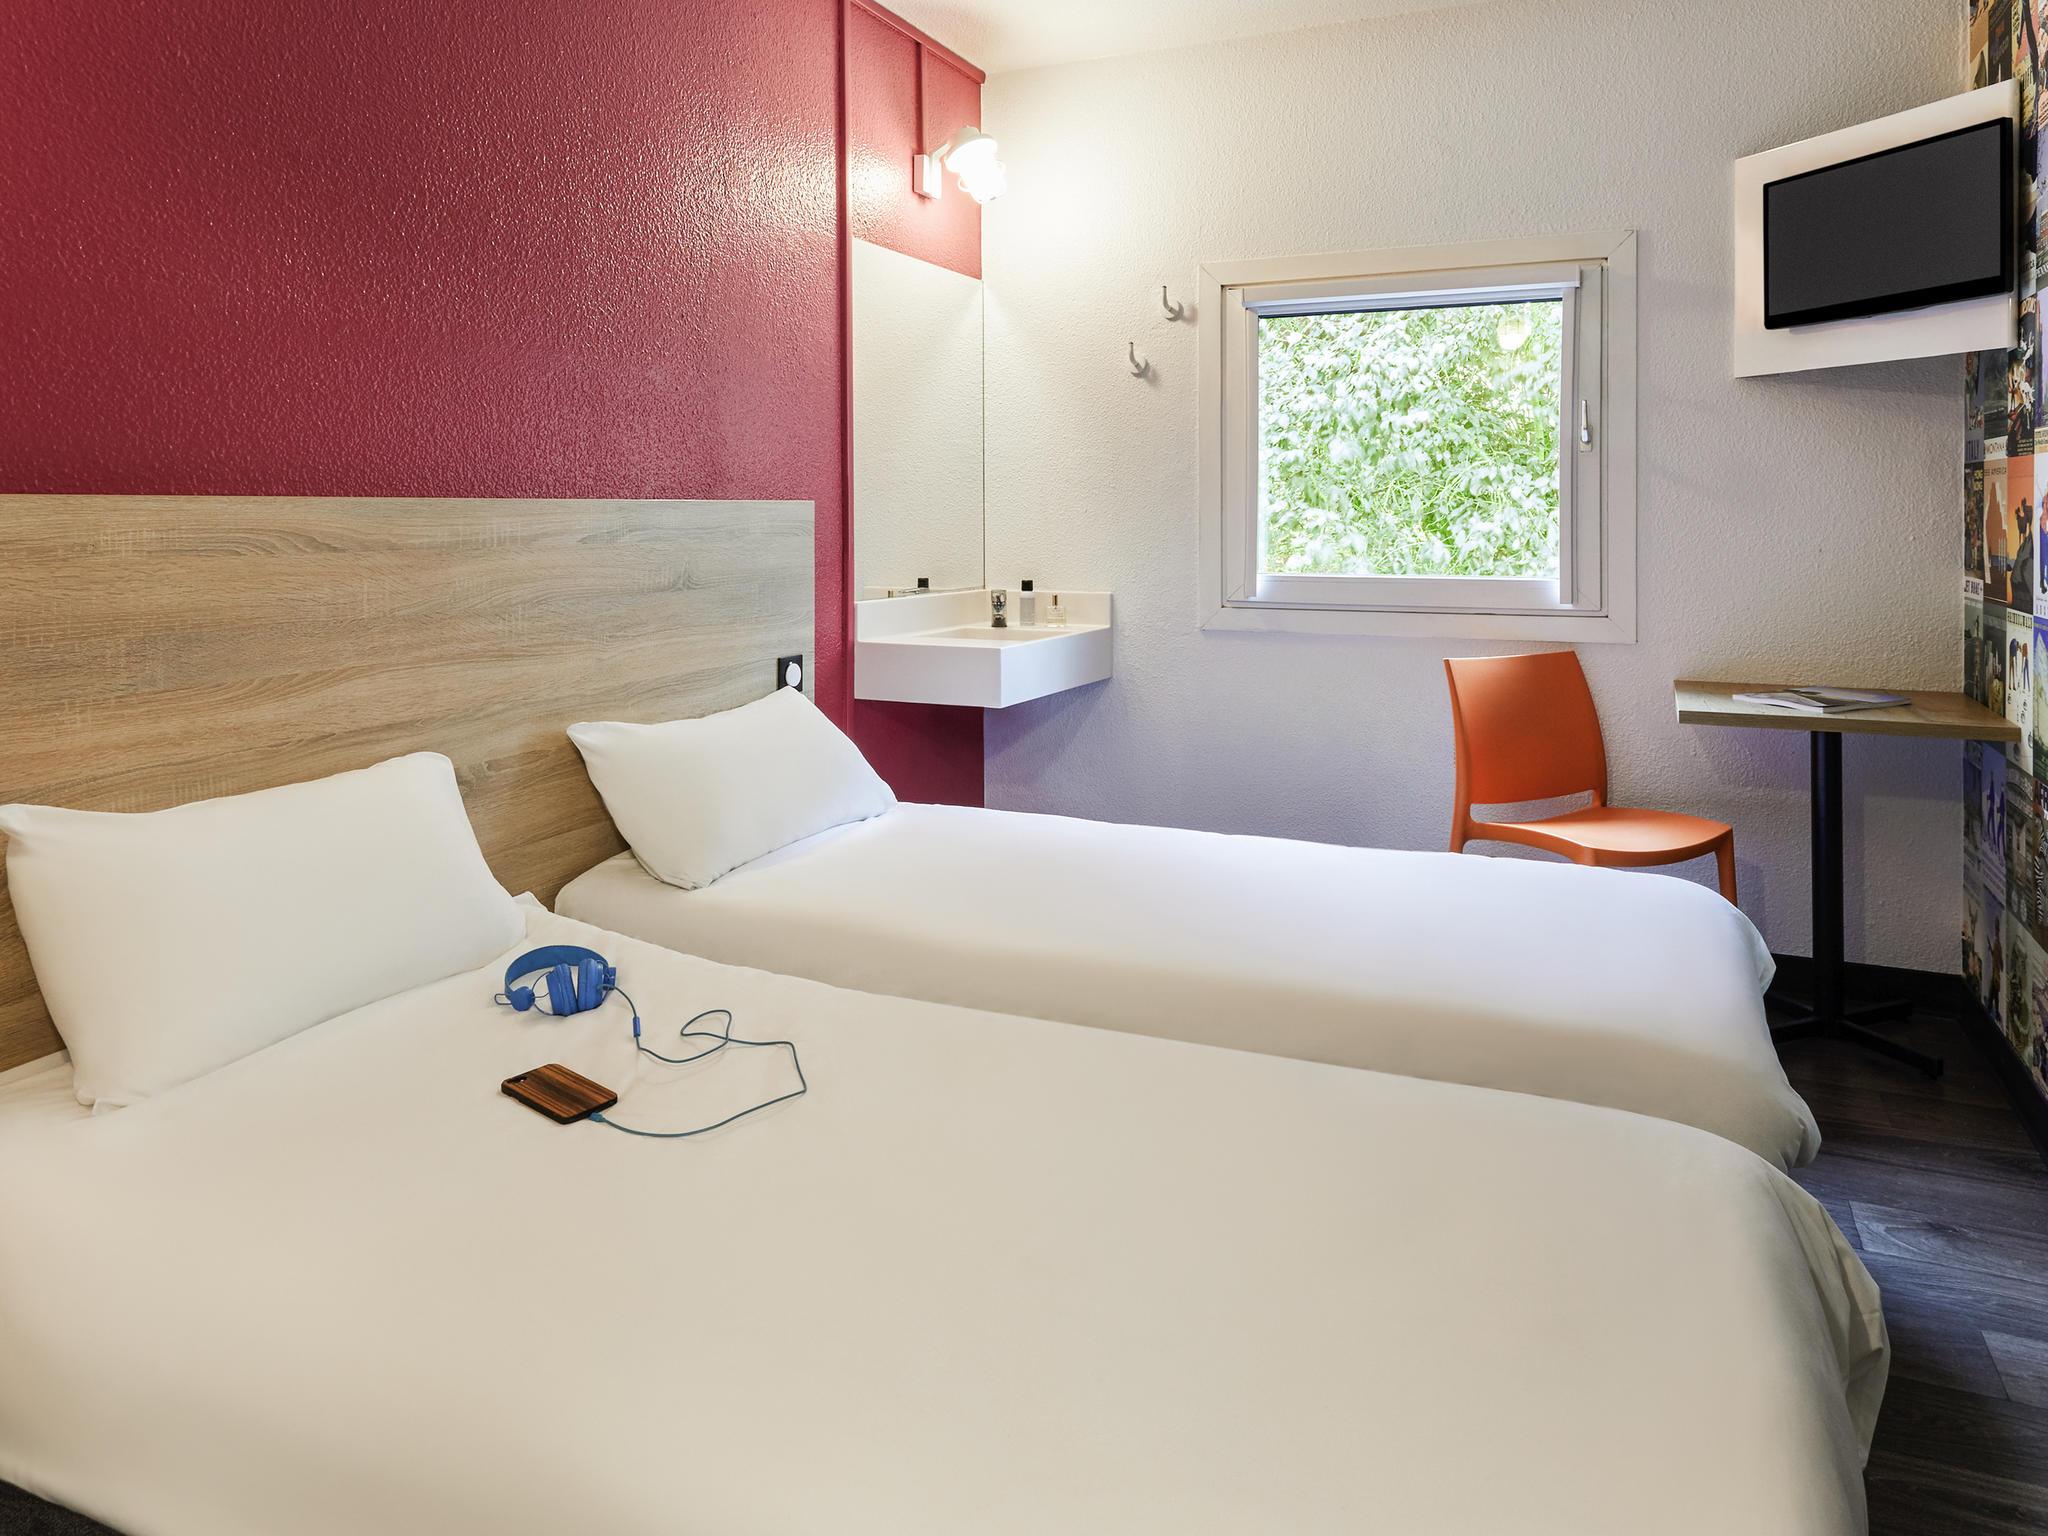 Отель — hotelF1 Rungis Orly (rénové)